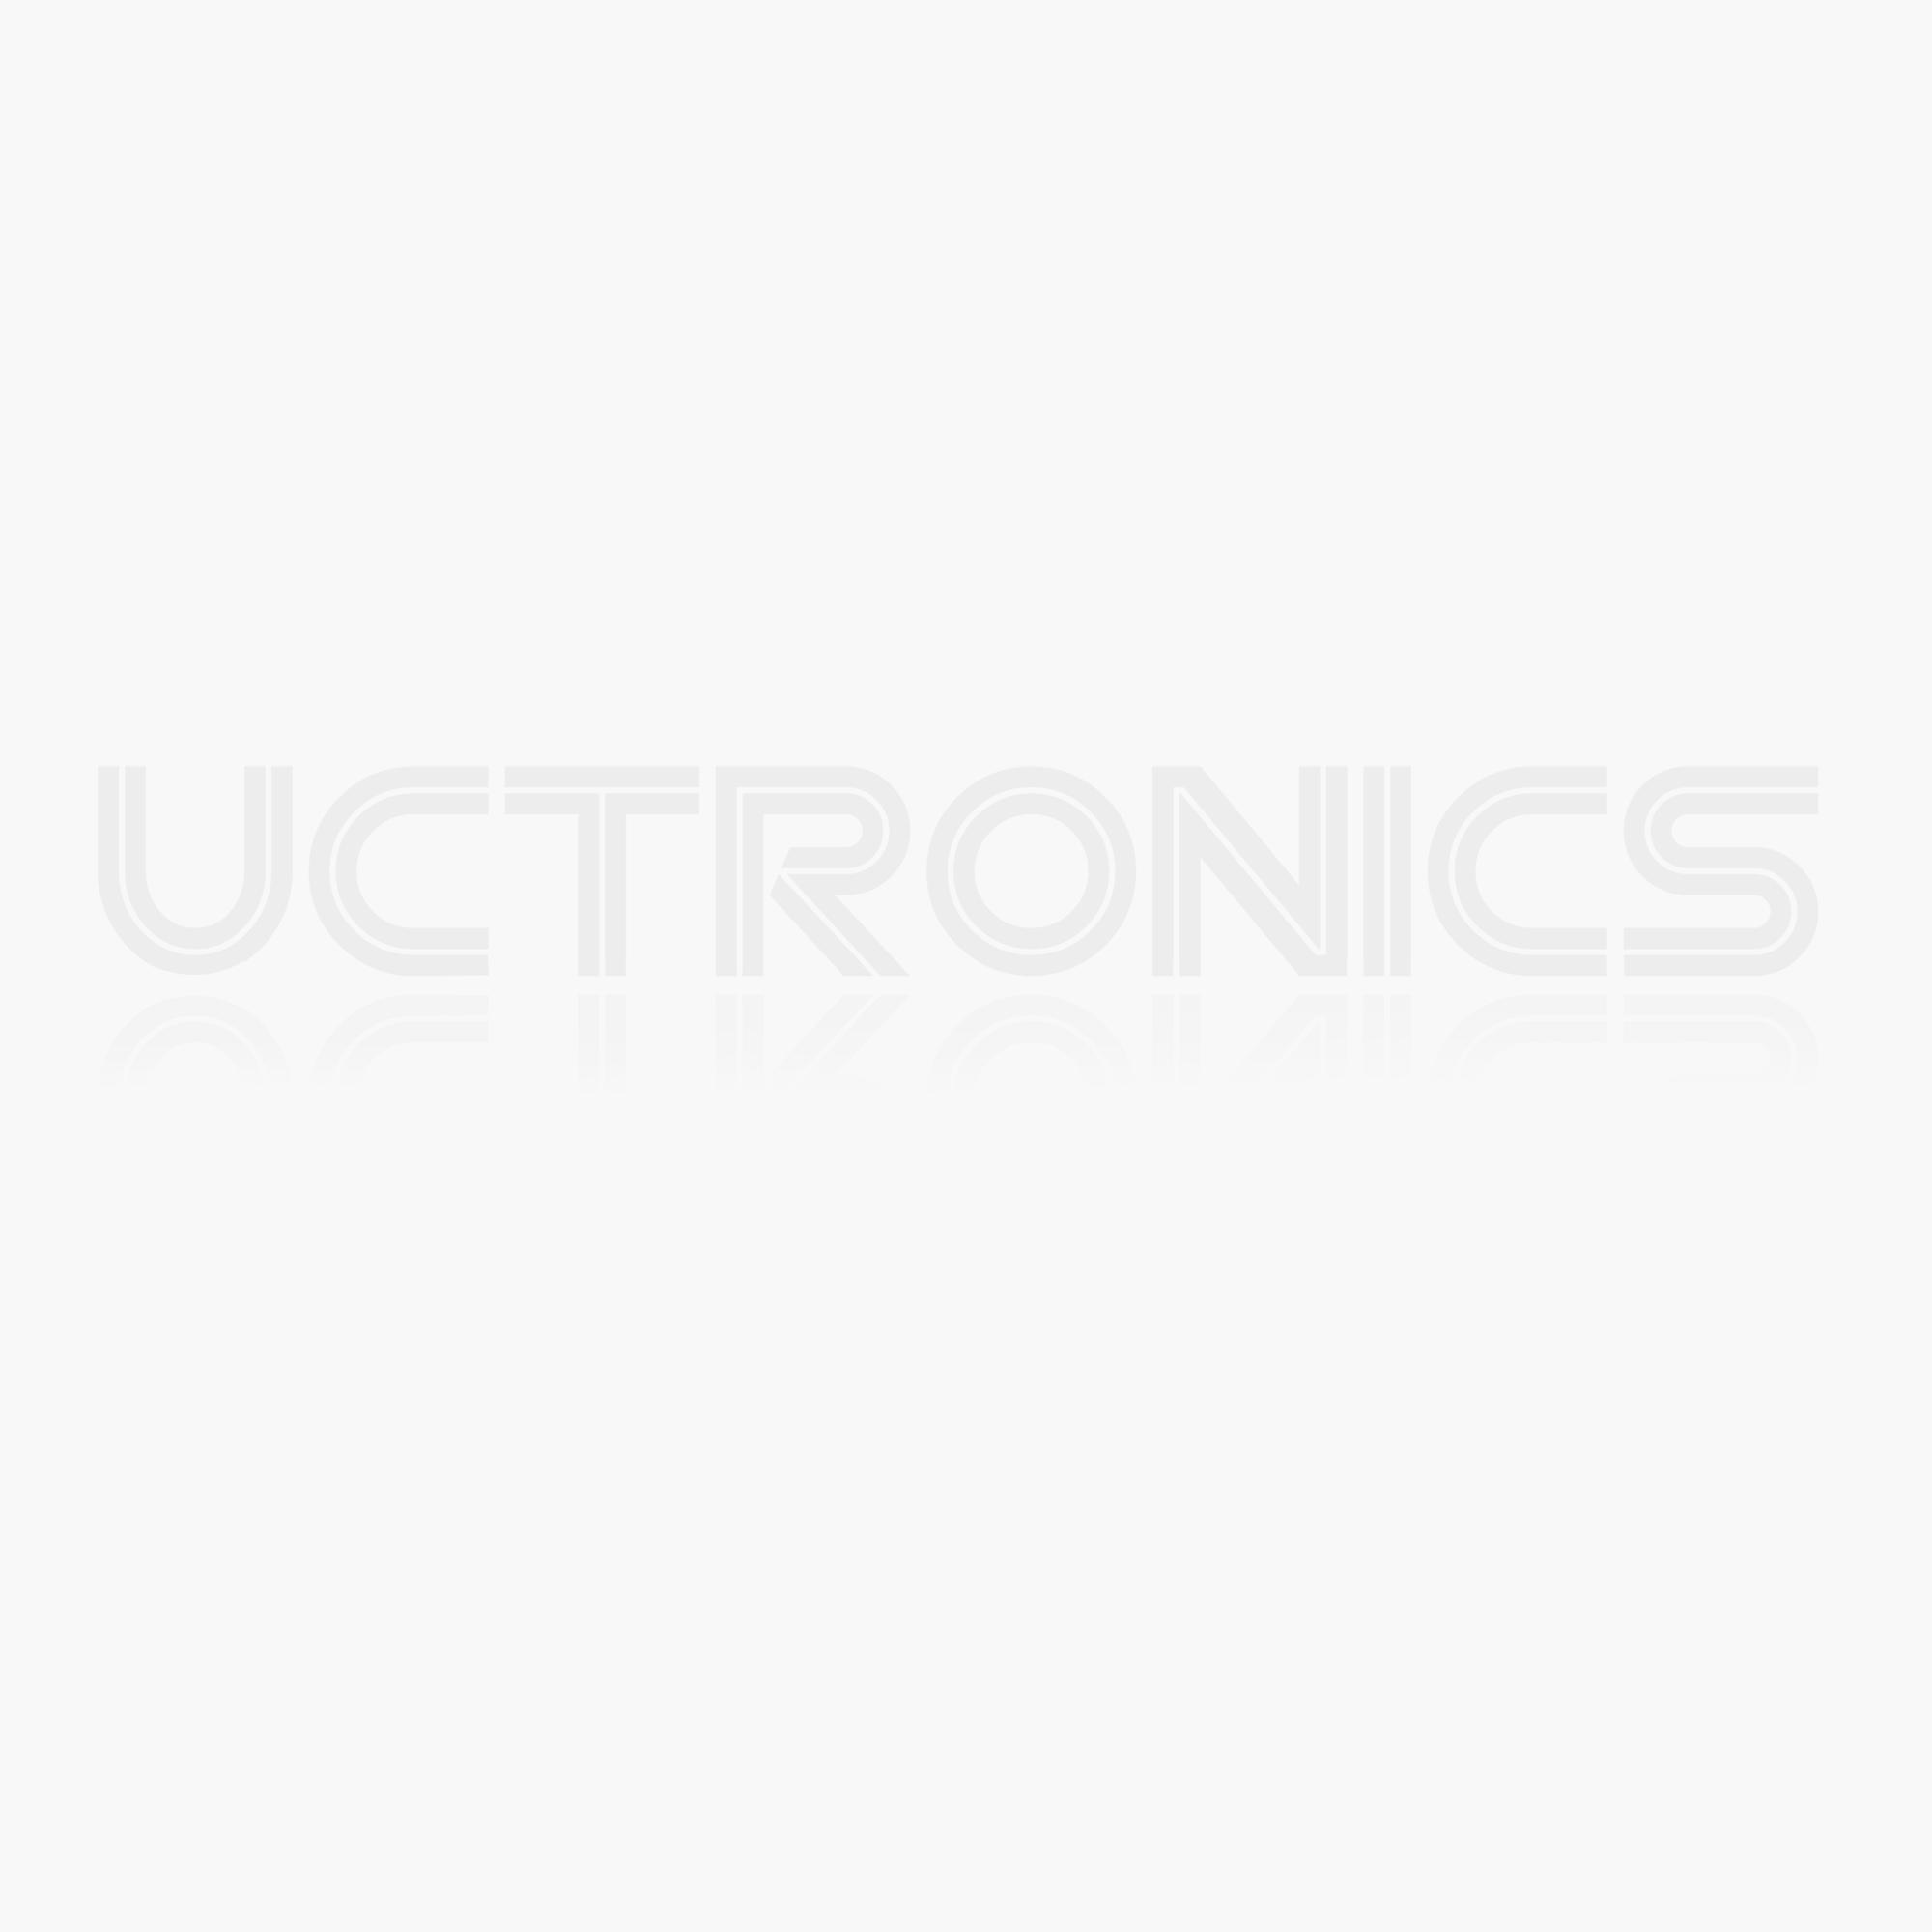 5MP OV5648 Auto Focus USB Camera Module UVC Compliance